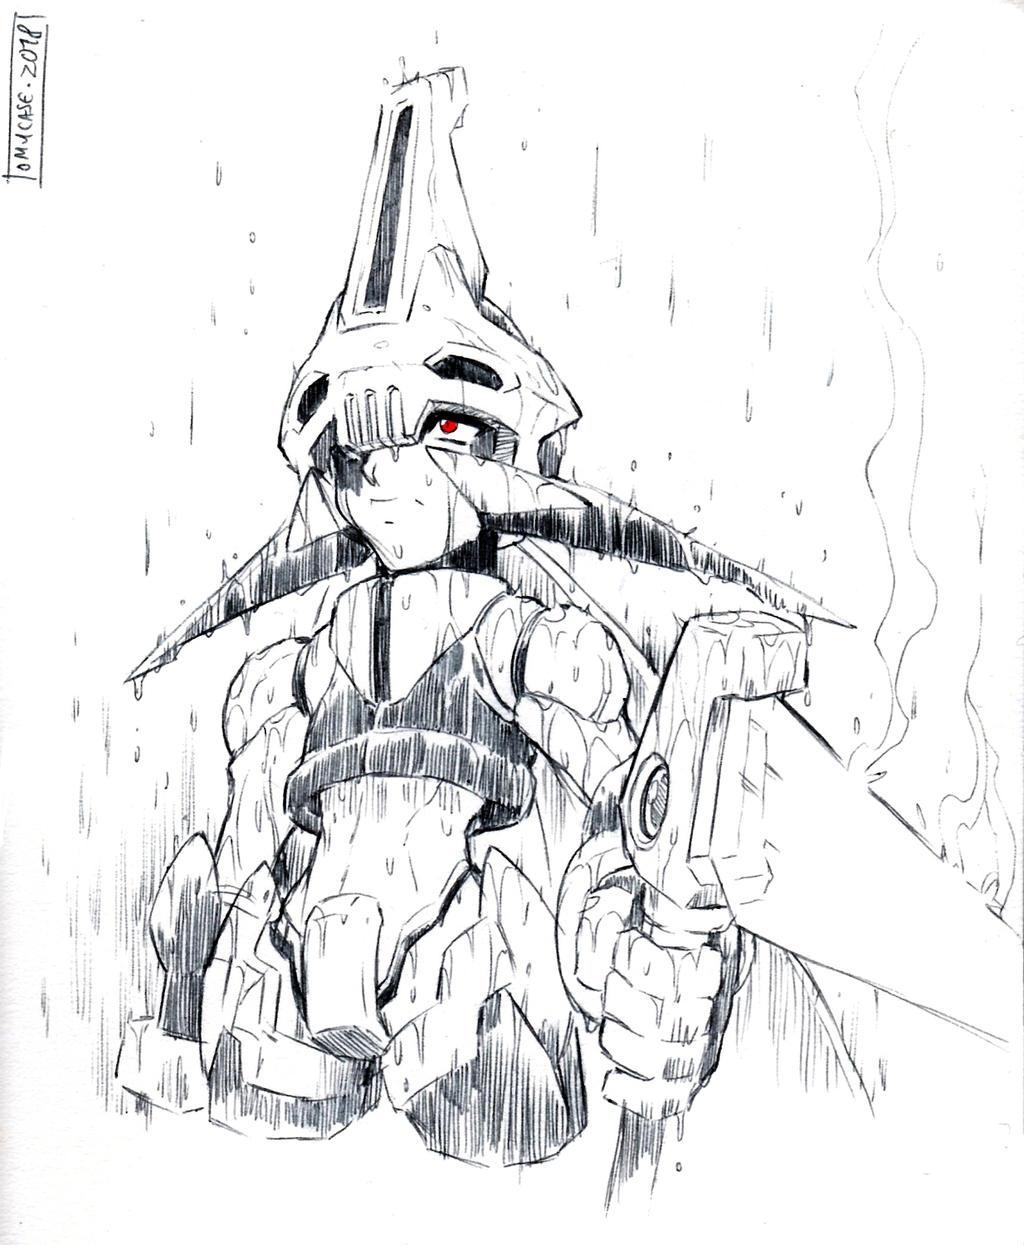 Rainy Day by Tomycase